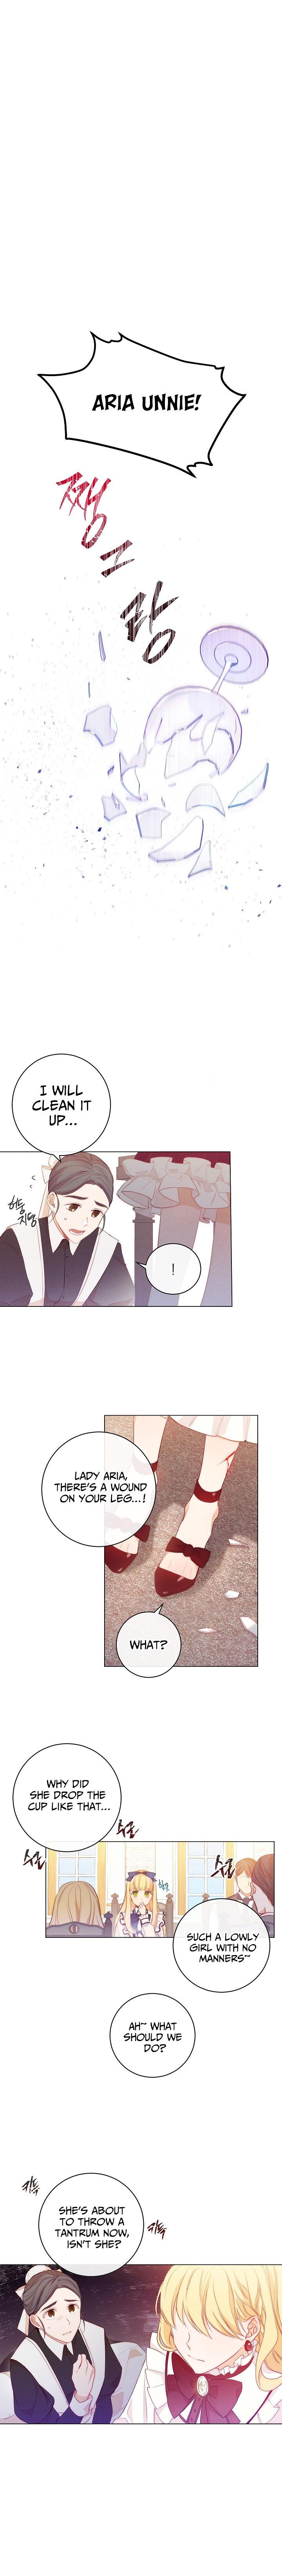 https://manga.mangadogs.com/comics/pic2/51/35315/1139986/542b9ce5413bbceea136fecb513df4c3.jpg Page 1